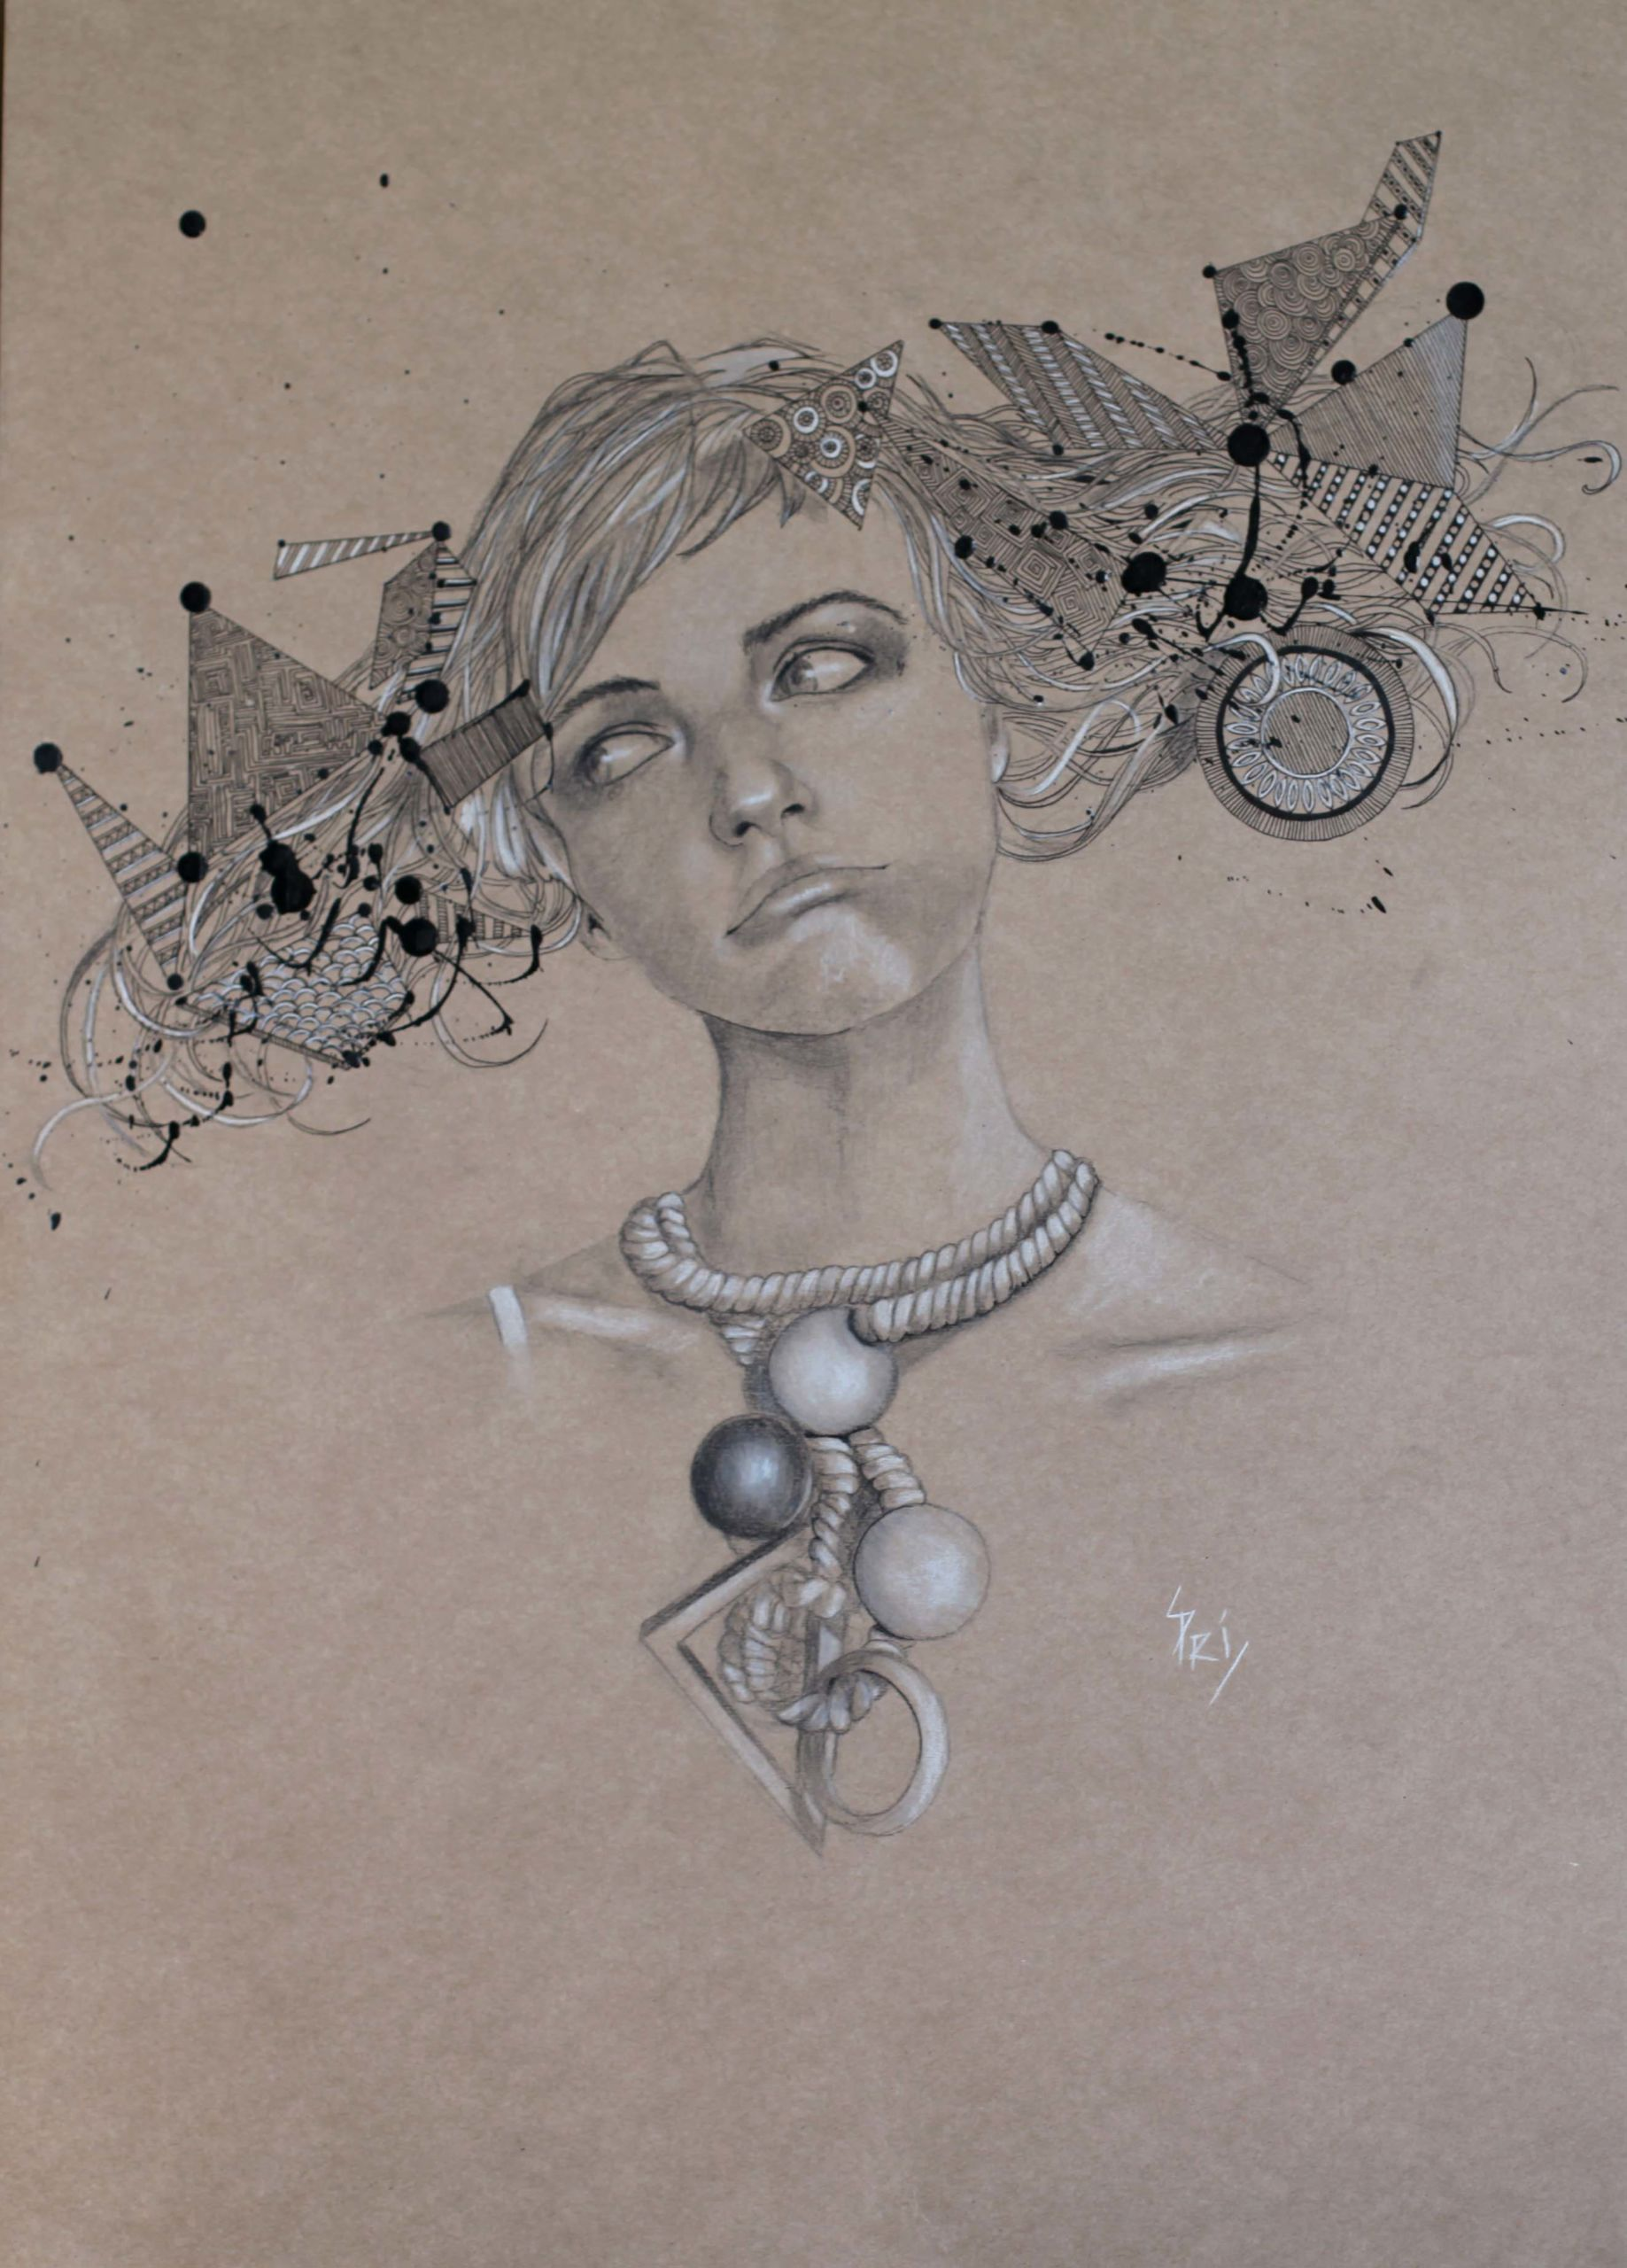 dessin sur carton craft par Priscilla Seiller, alias S.Pri